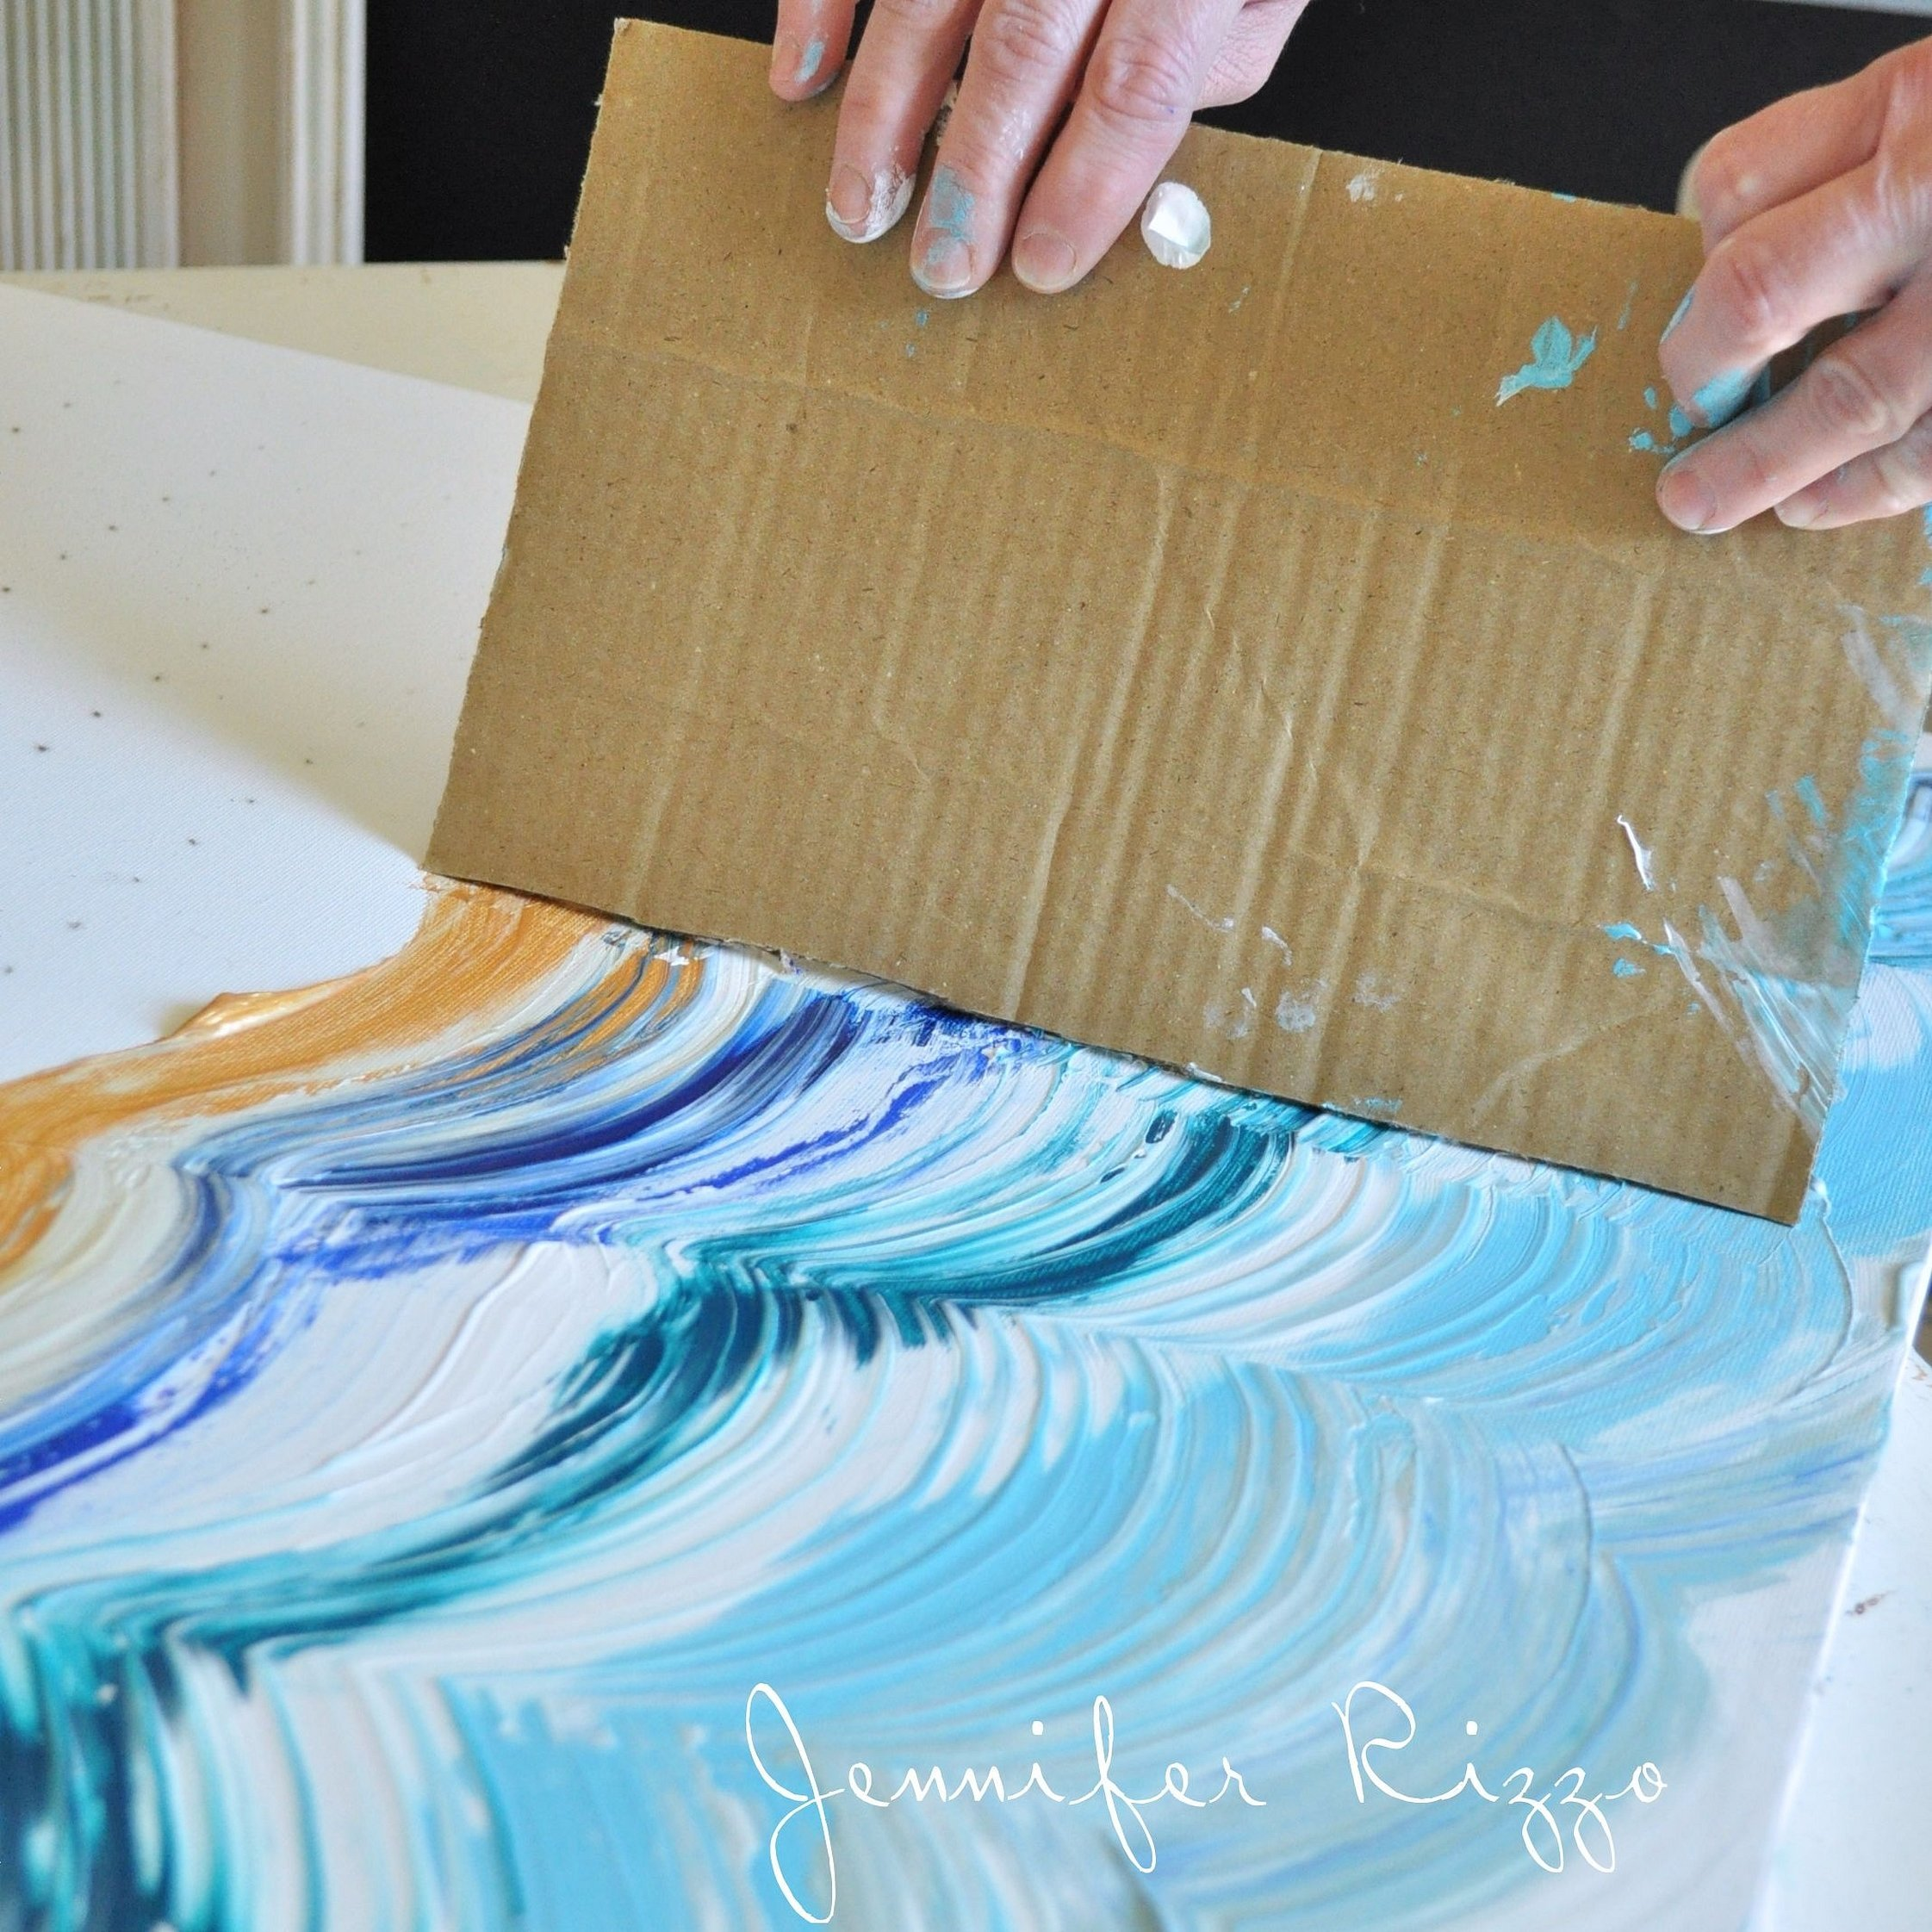 Холст для рисования своими руками